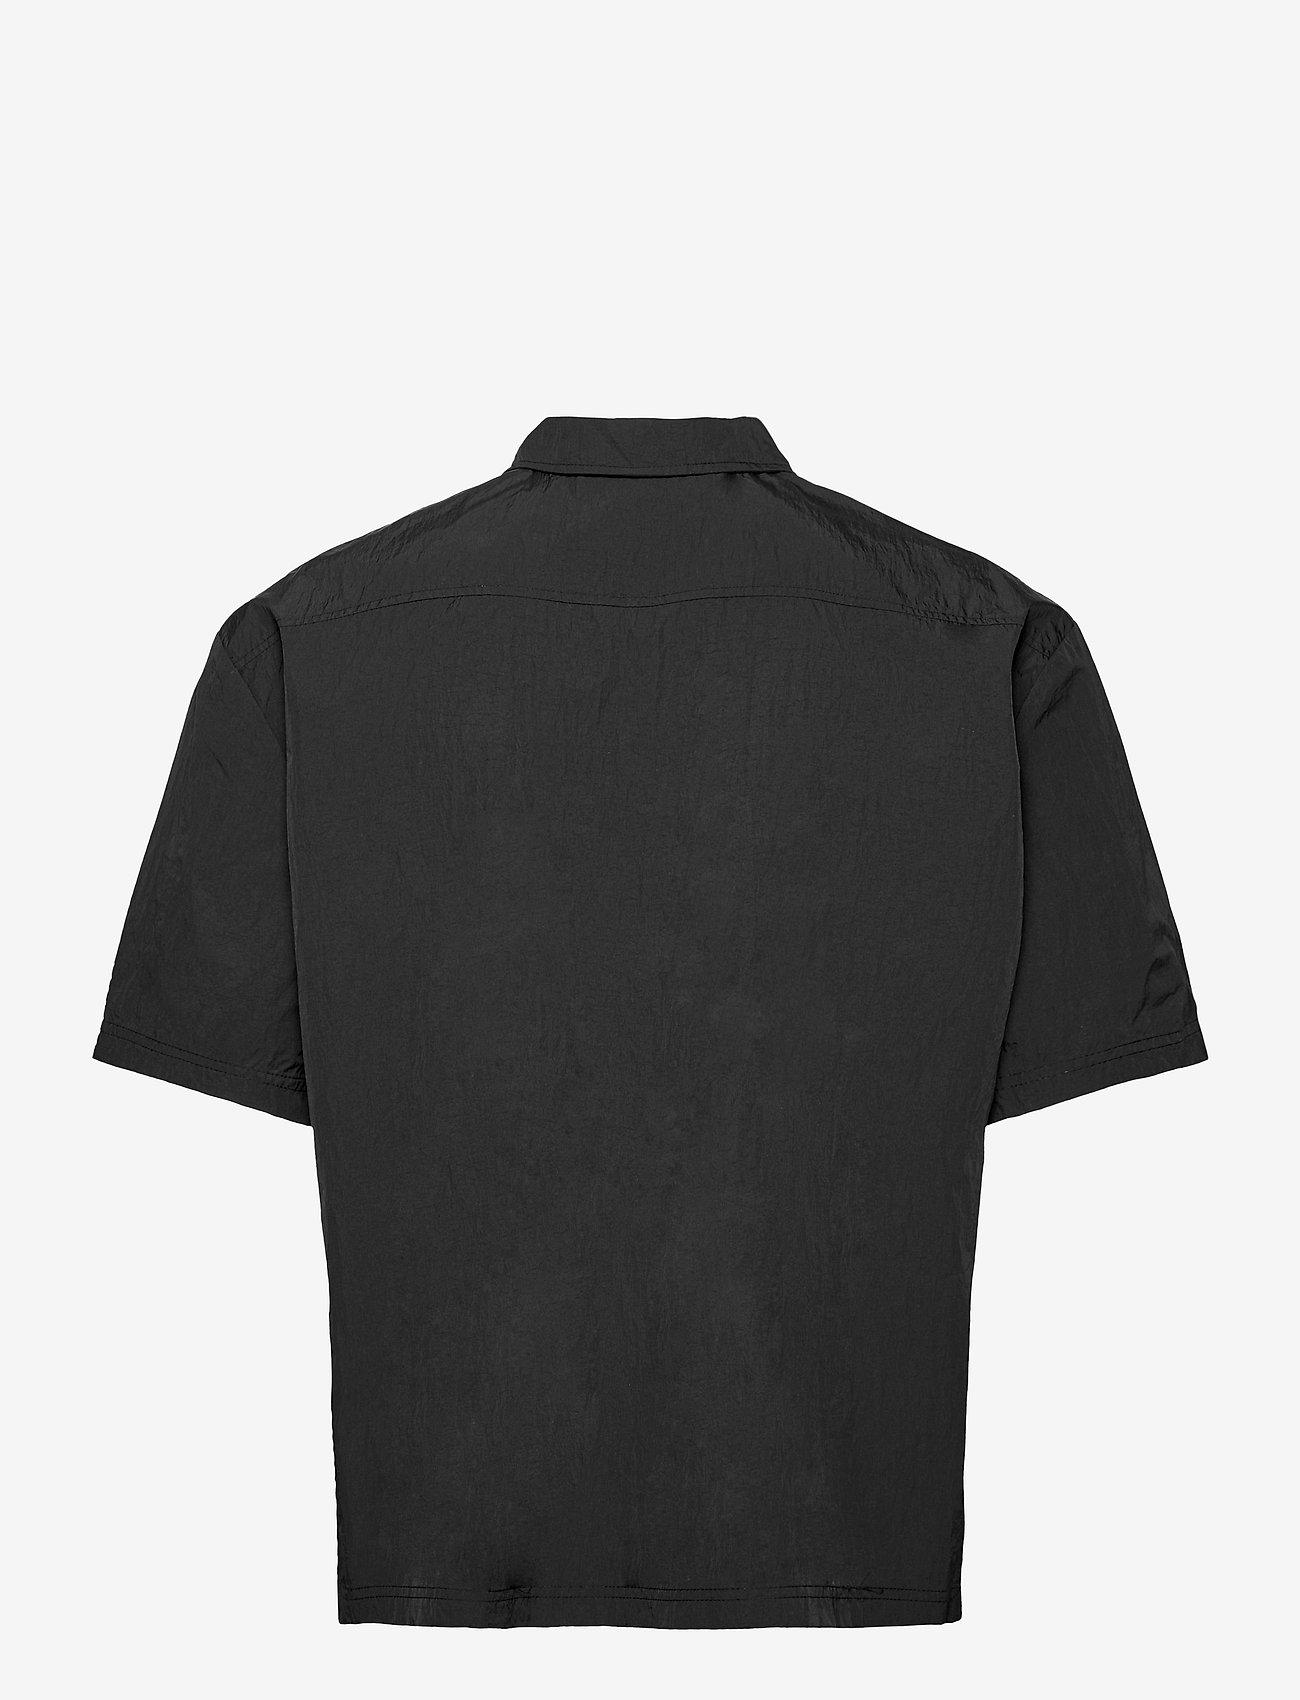 Hummel - hmlWILLY HOME BOY SHIRT - basic overhemden - black - 1